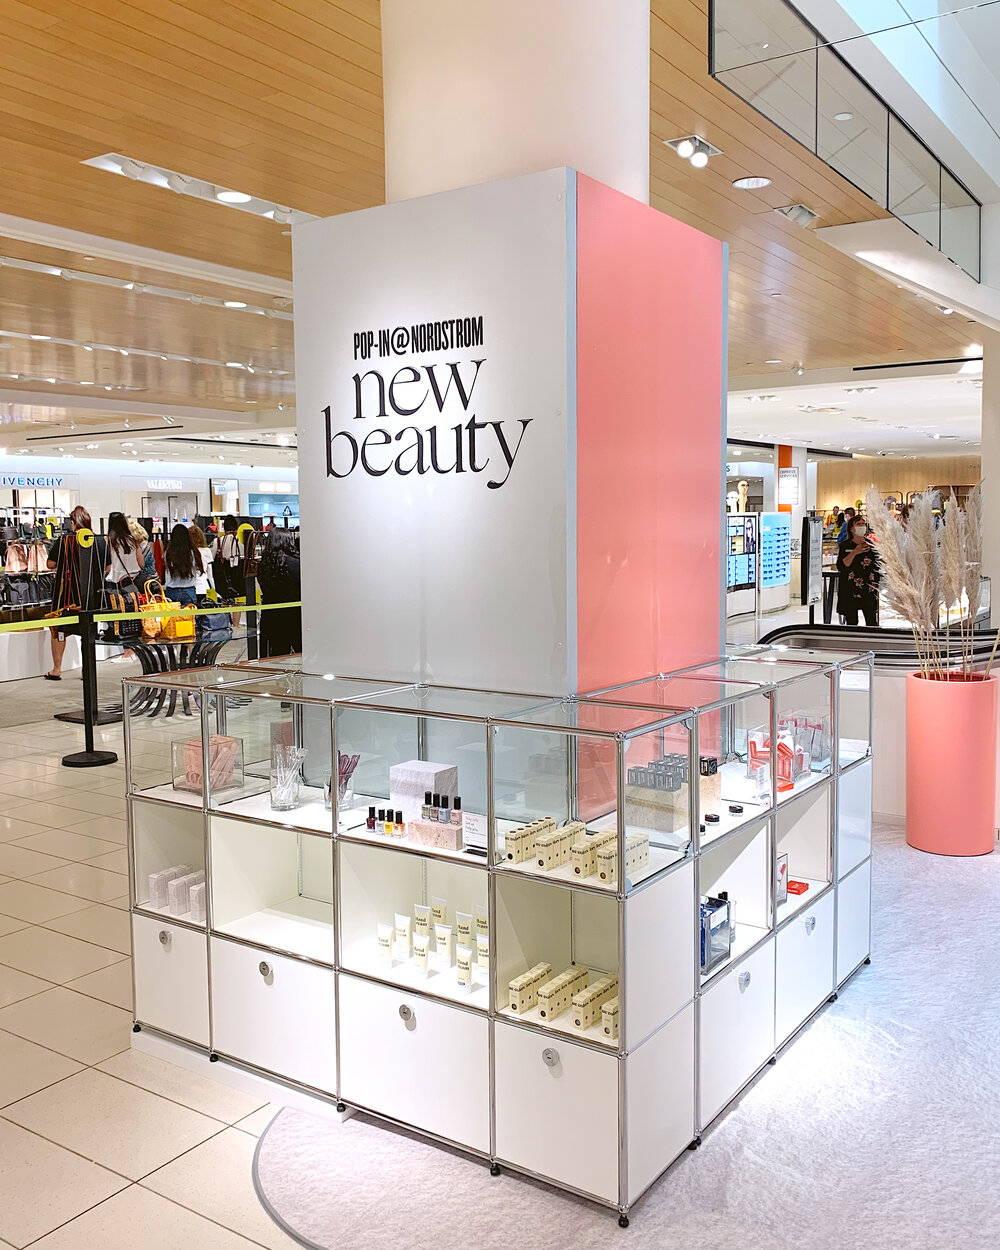 nordstrom-shop-popin-new-beauty-wellness-collagen-supplement-brands-wholydose